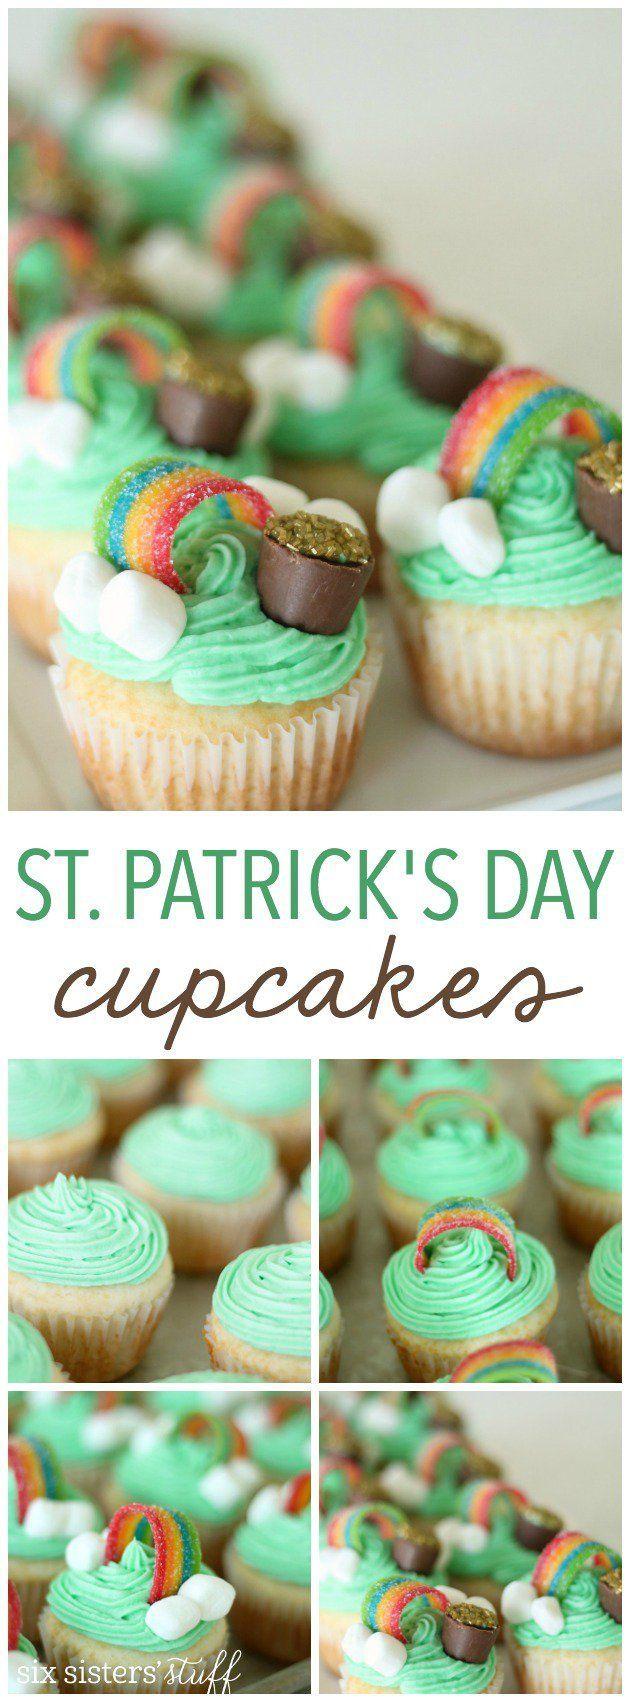 St. Patrick's Day Cupcakes from SixSistersStuff.com | Kids School Dessert Ideas | St Patricks Day Ideas